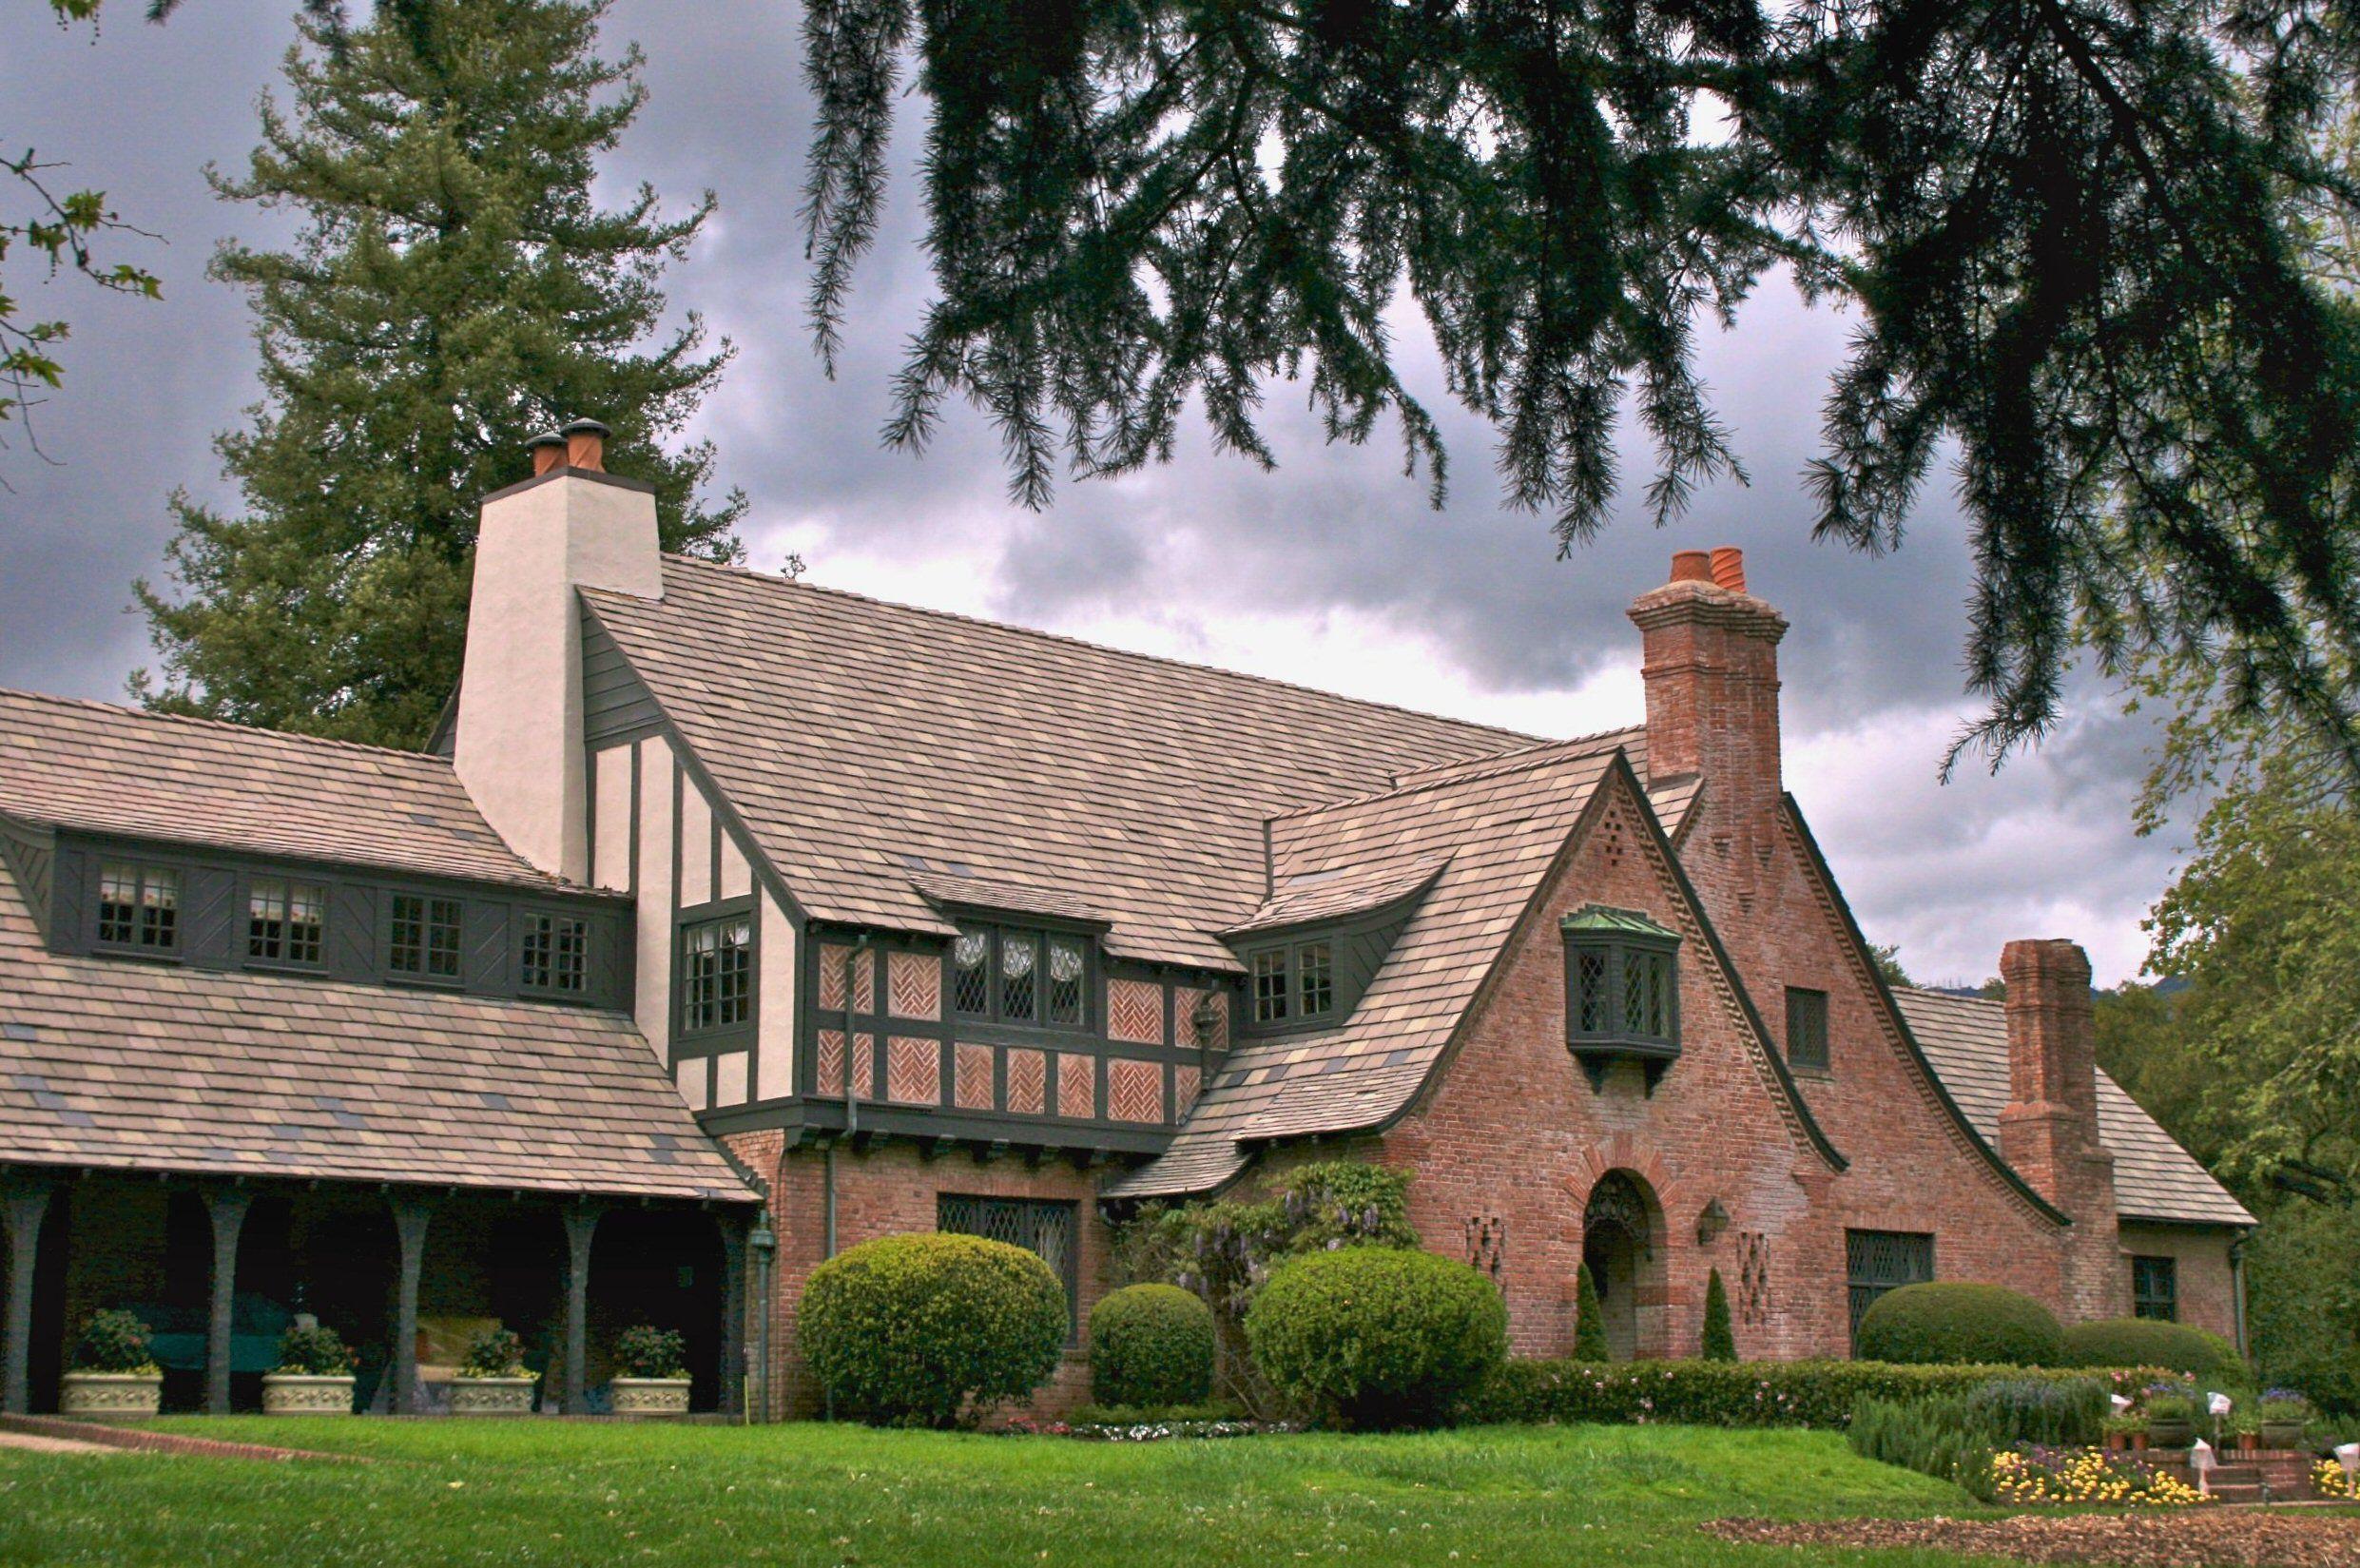 large, brick mansion with English-tudor details